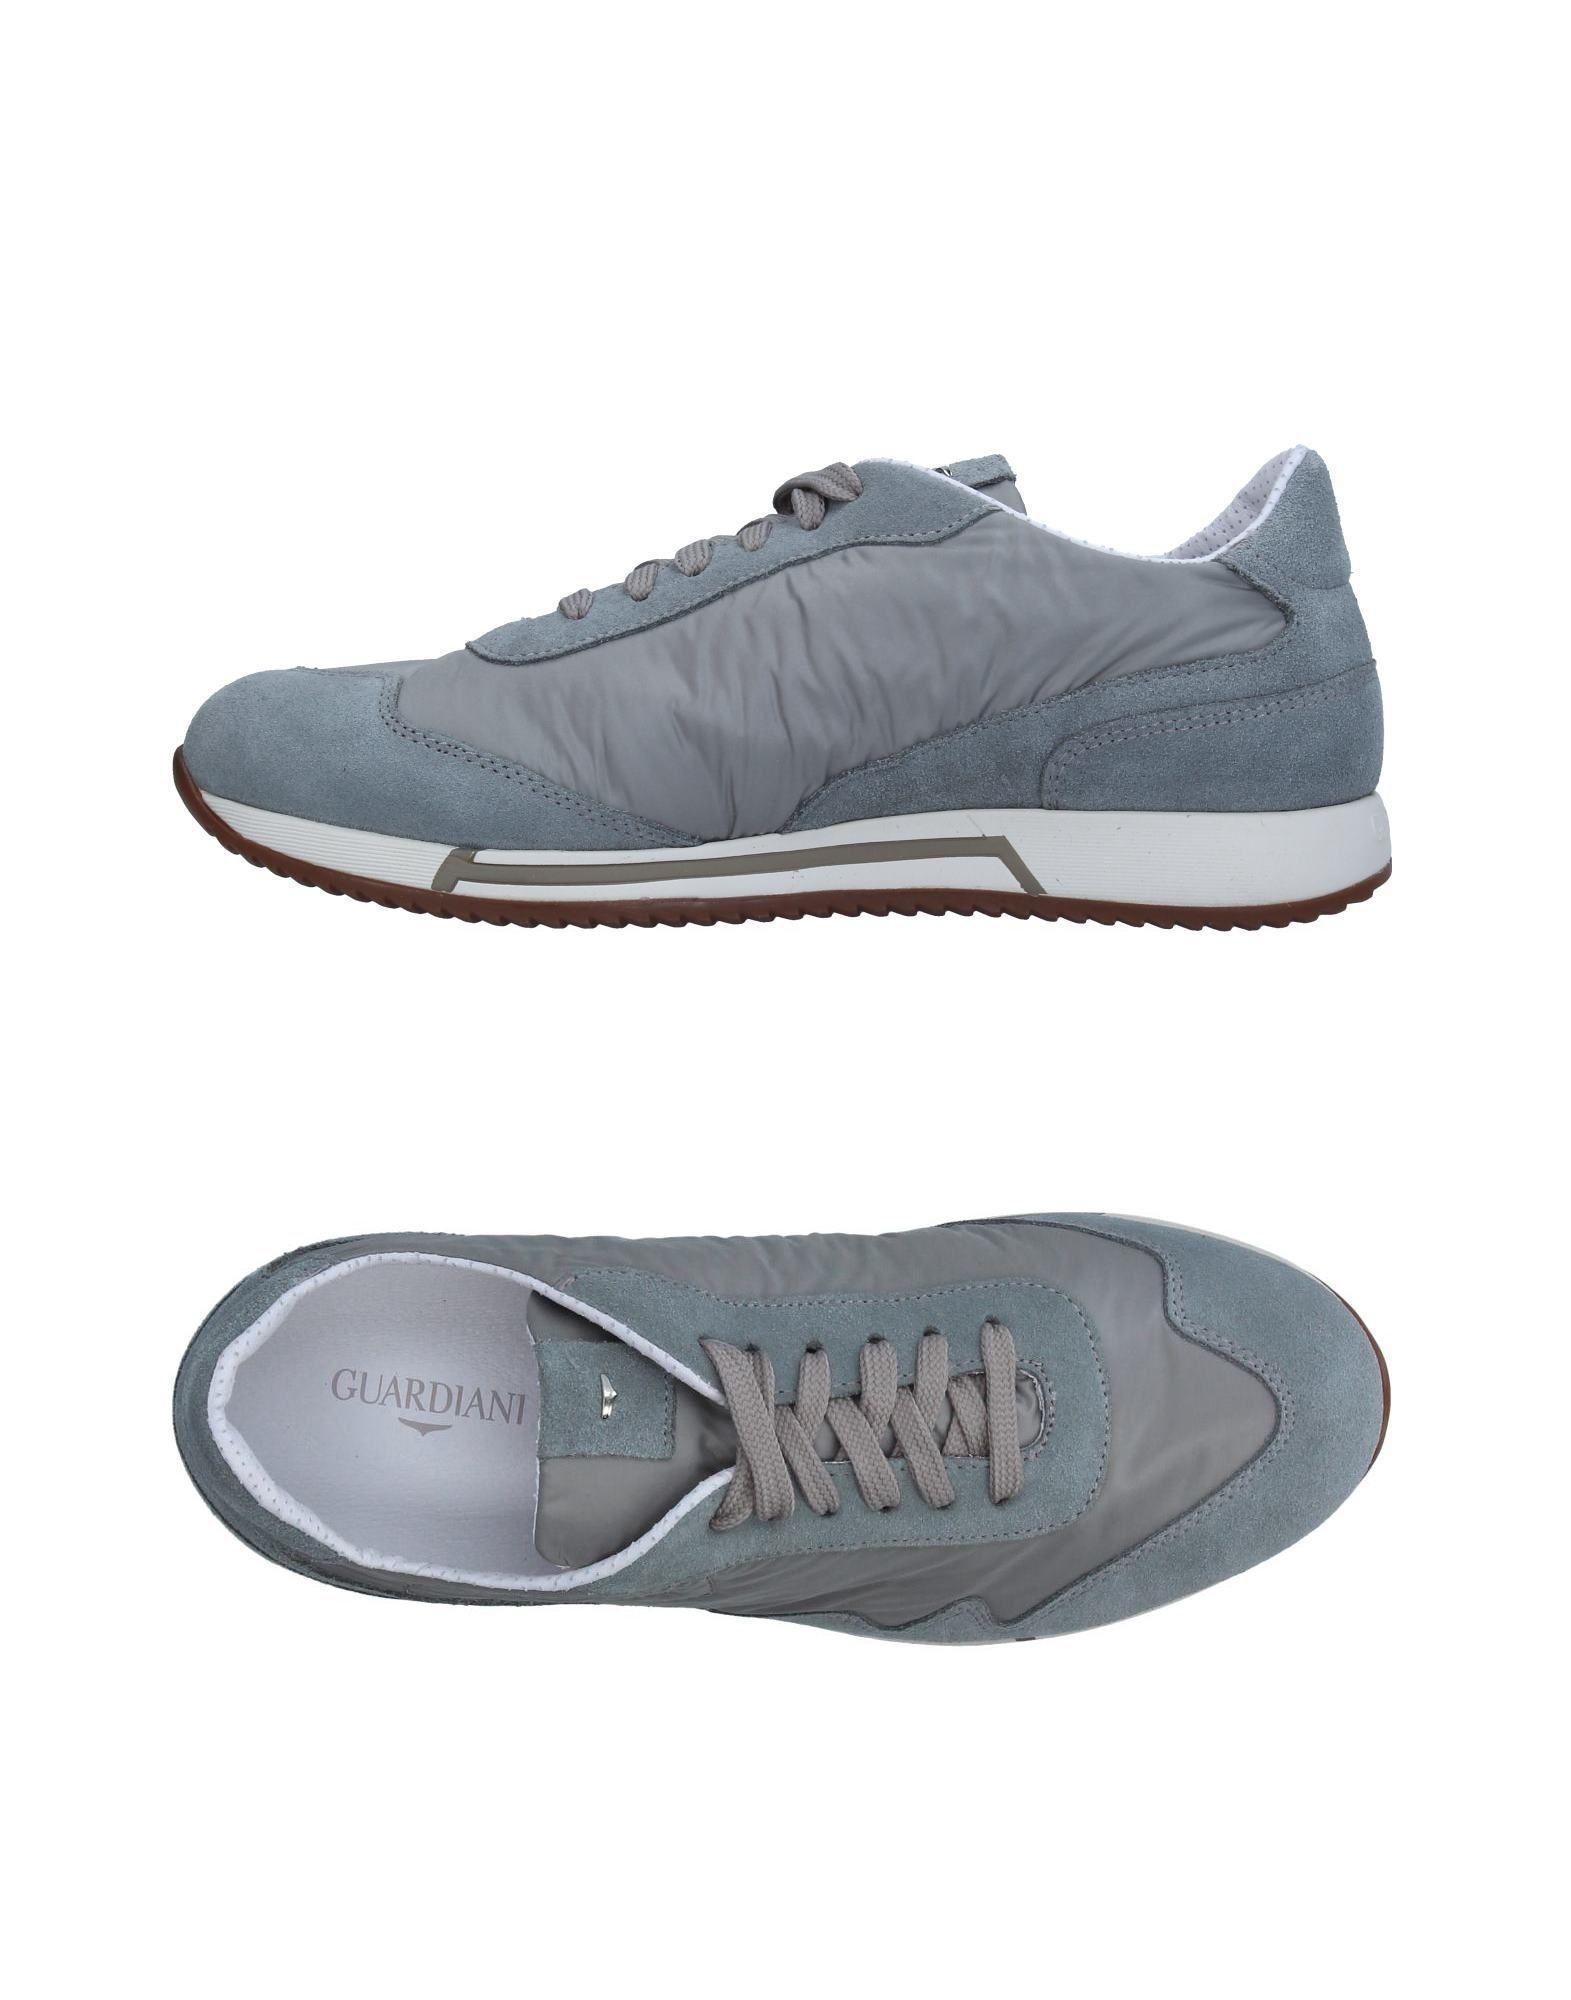 FOOTWEAR - Low-tops & sneakers Alberto Guardiani Sale Online Store Free Shipping Visit 0Qpxun